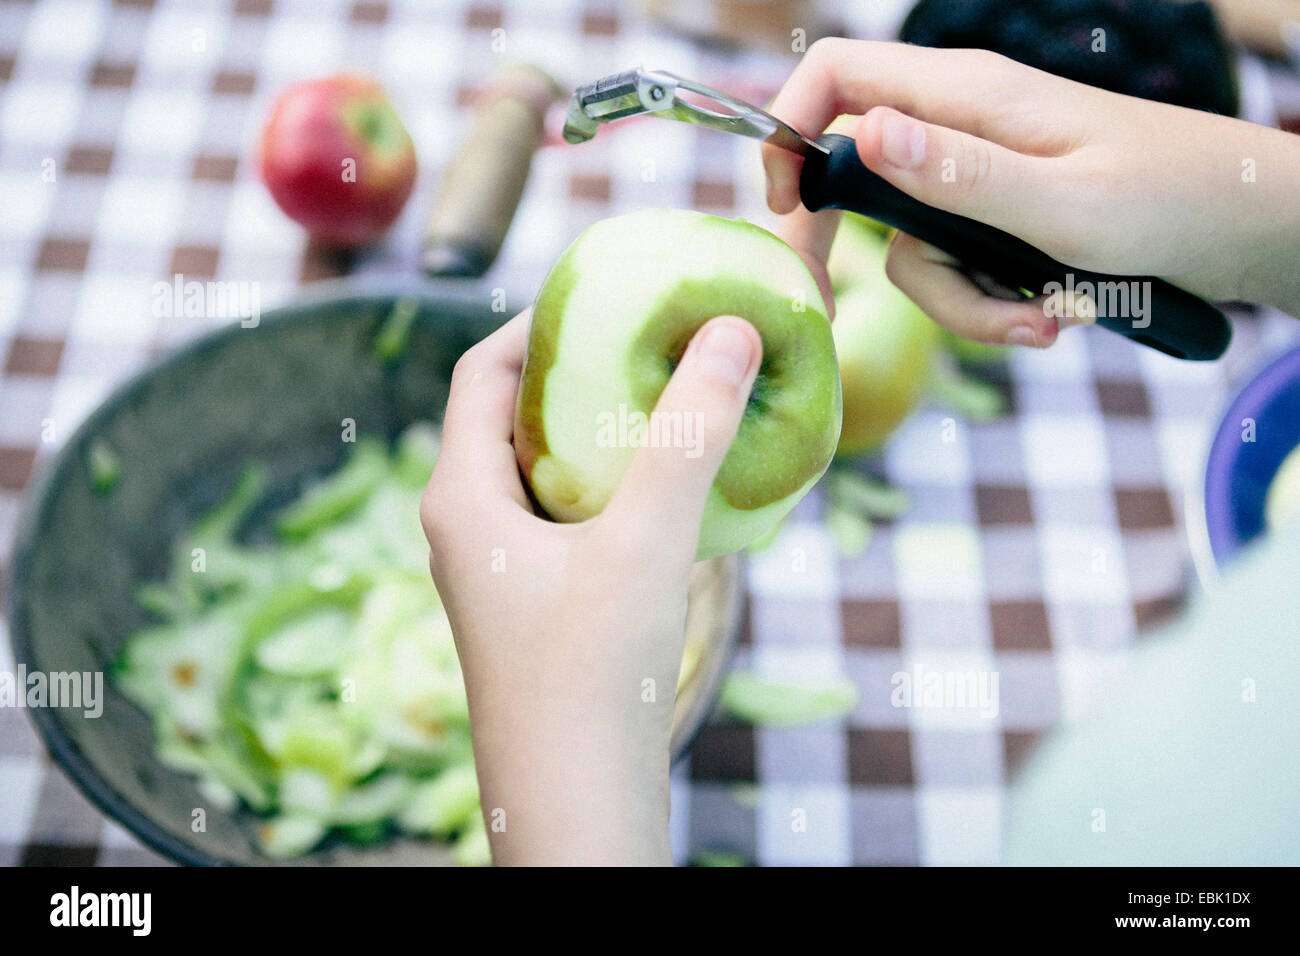 Personne peeling apple Photo Stock